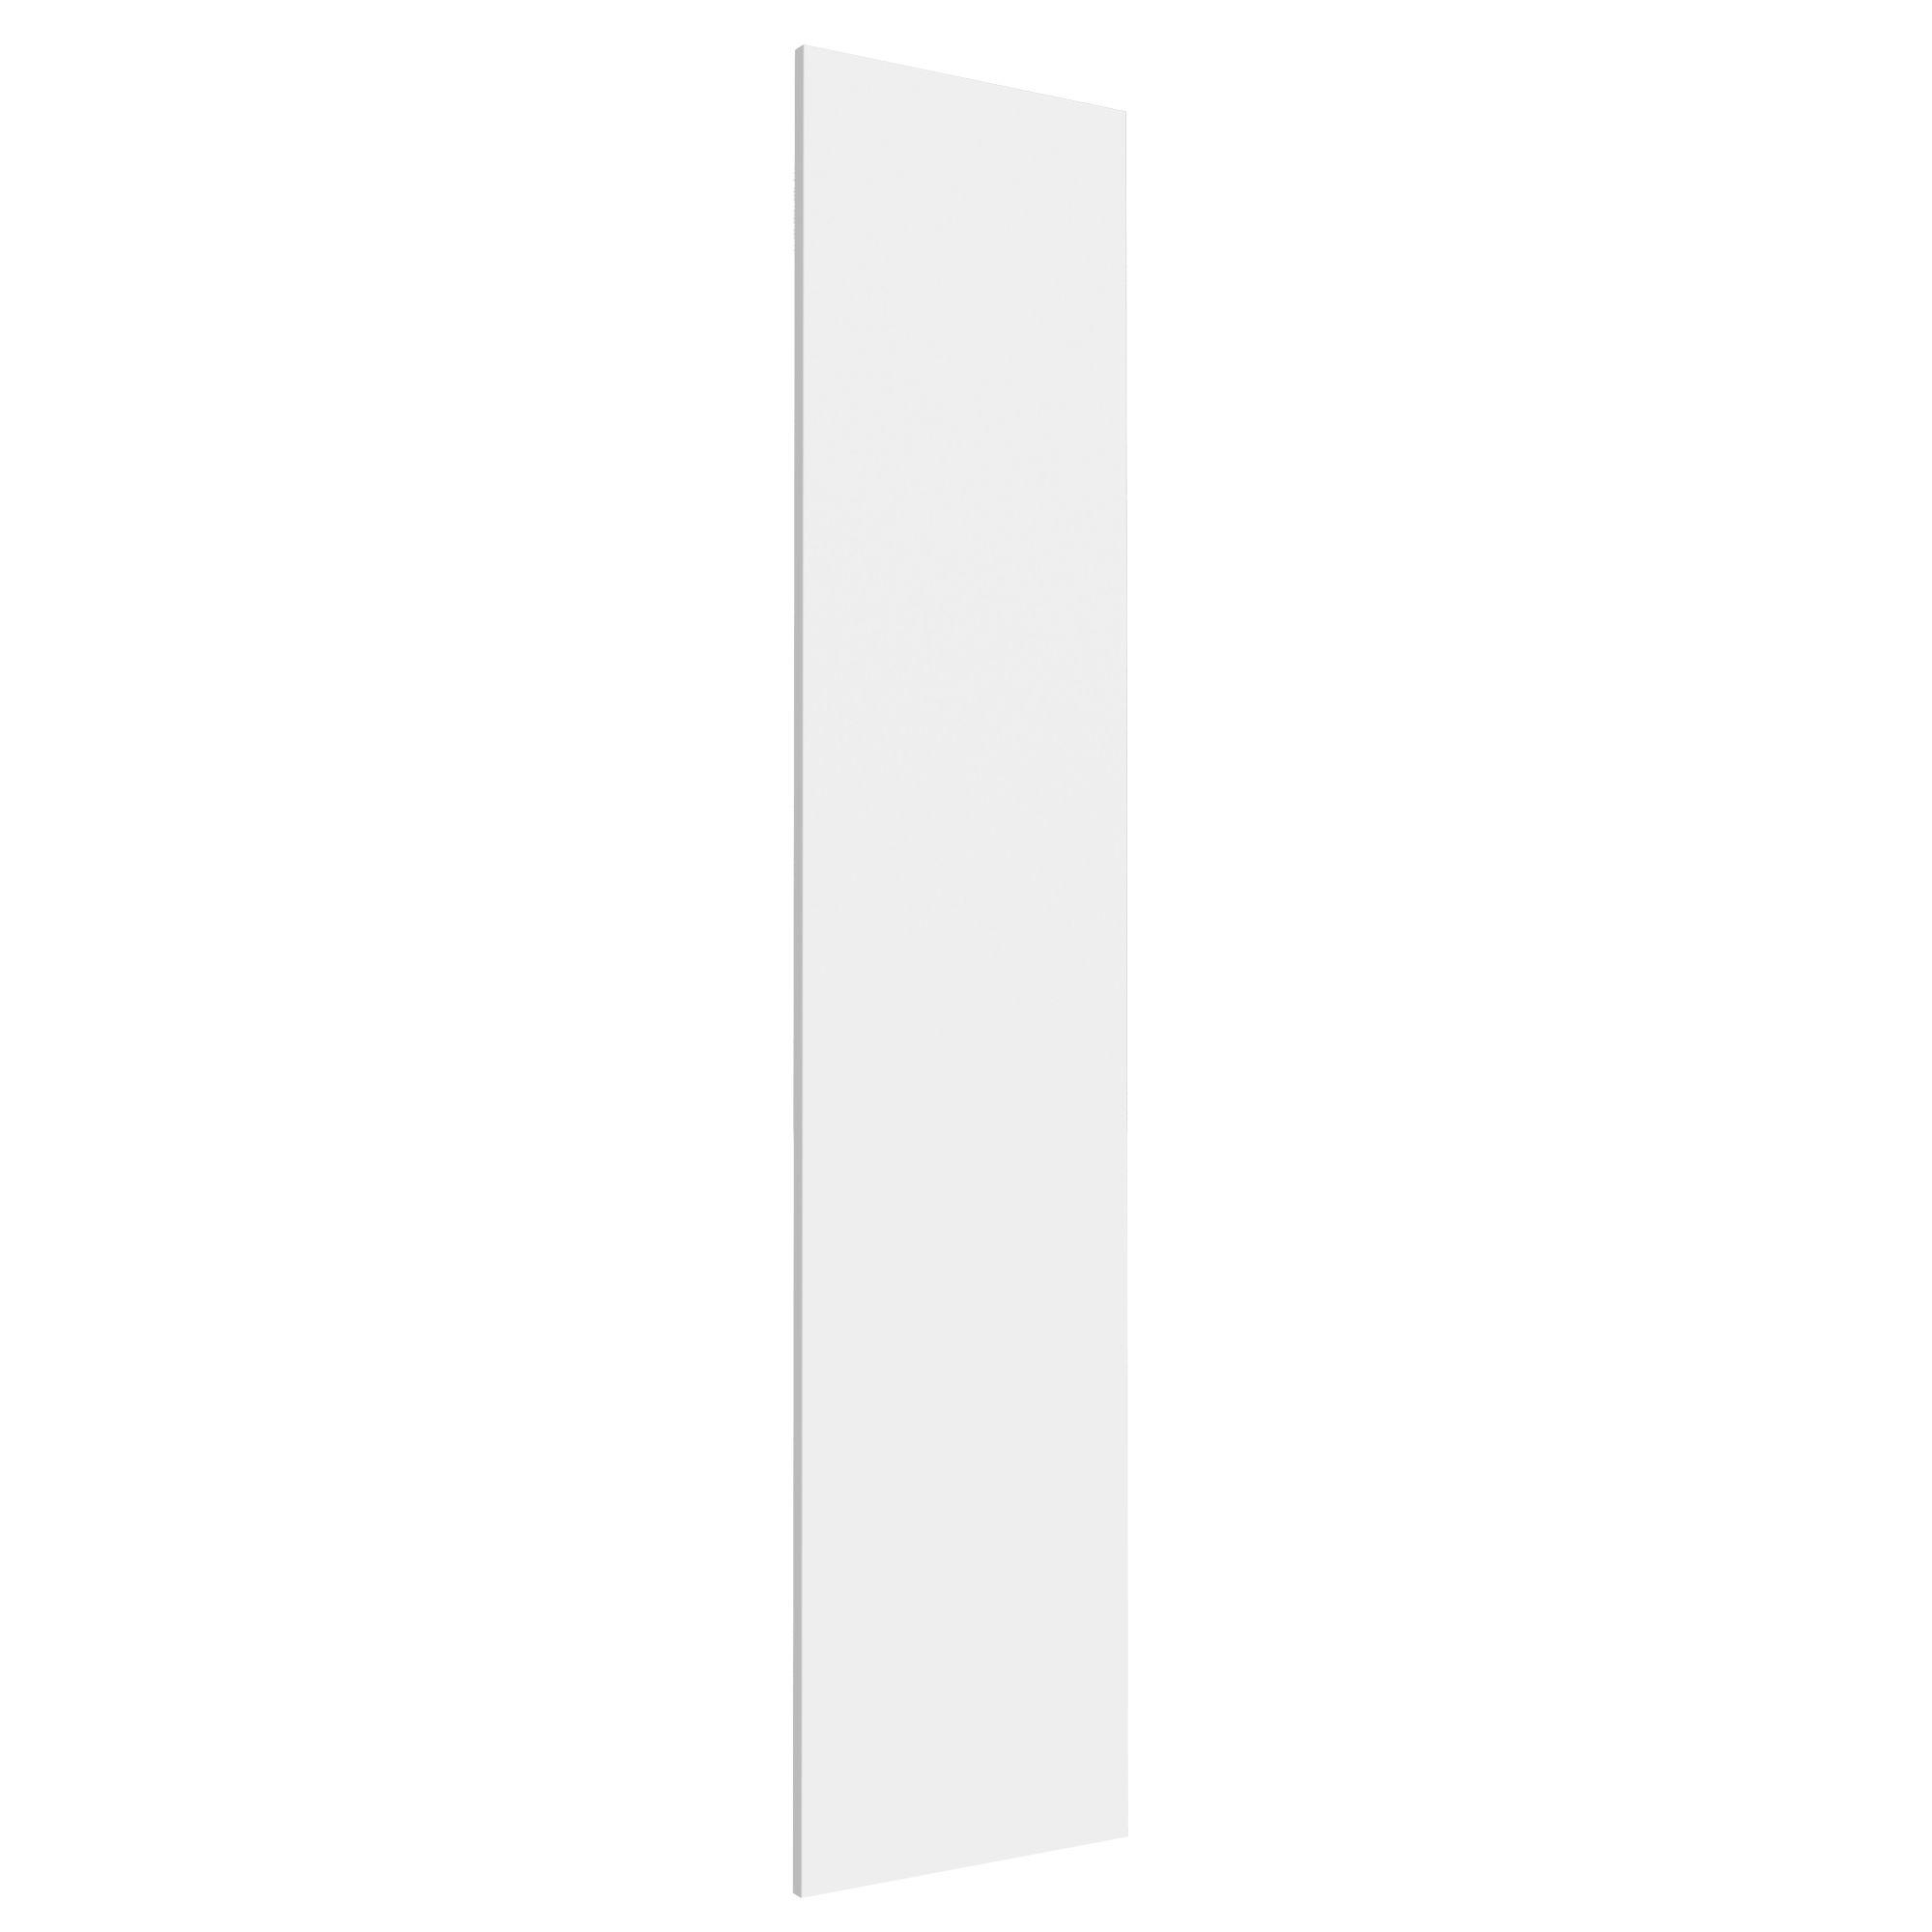 Darwin Modular White Wardrobe Door (h)1936mm (w)372mm